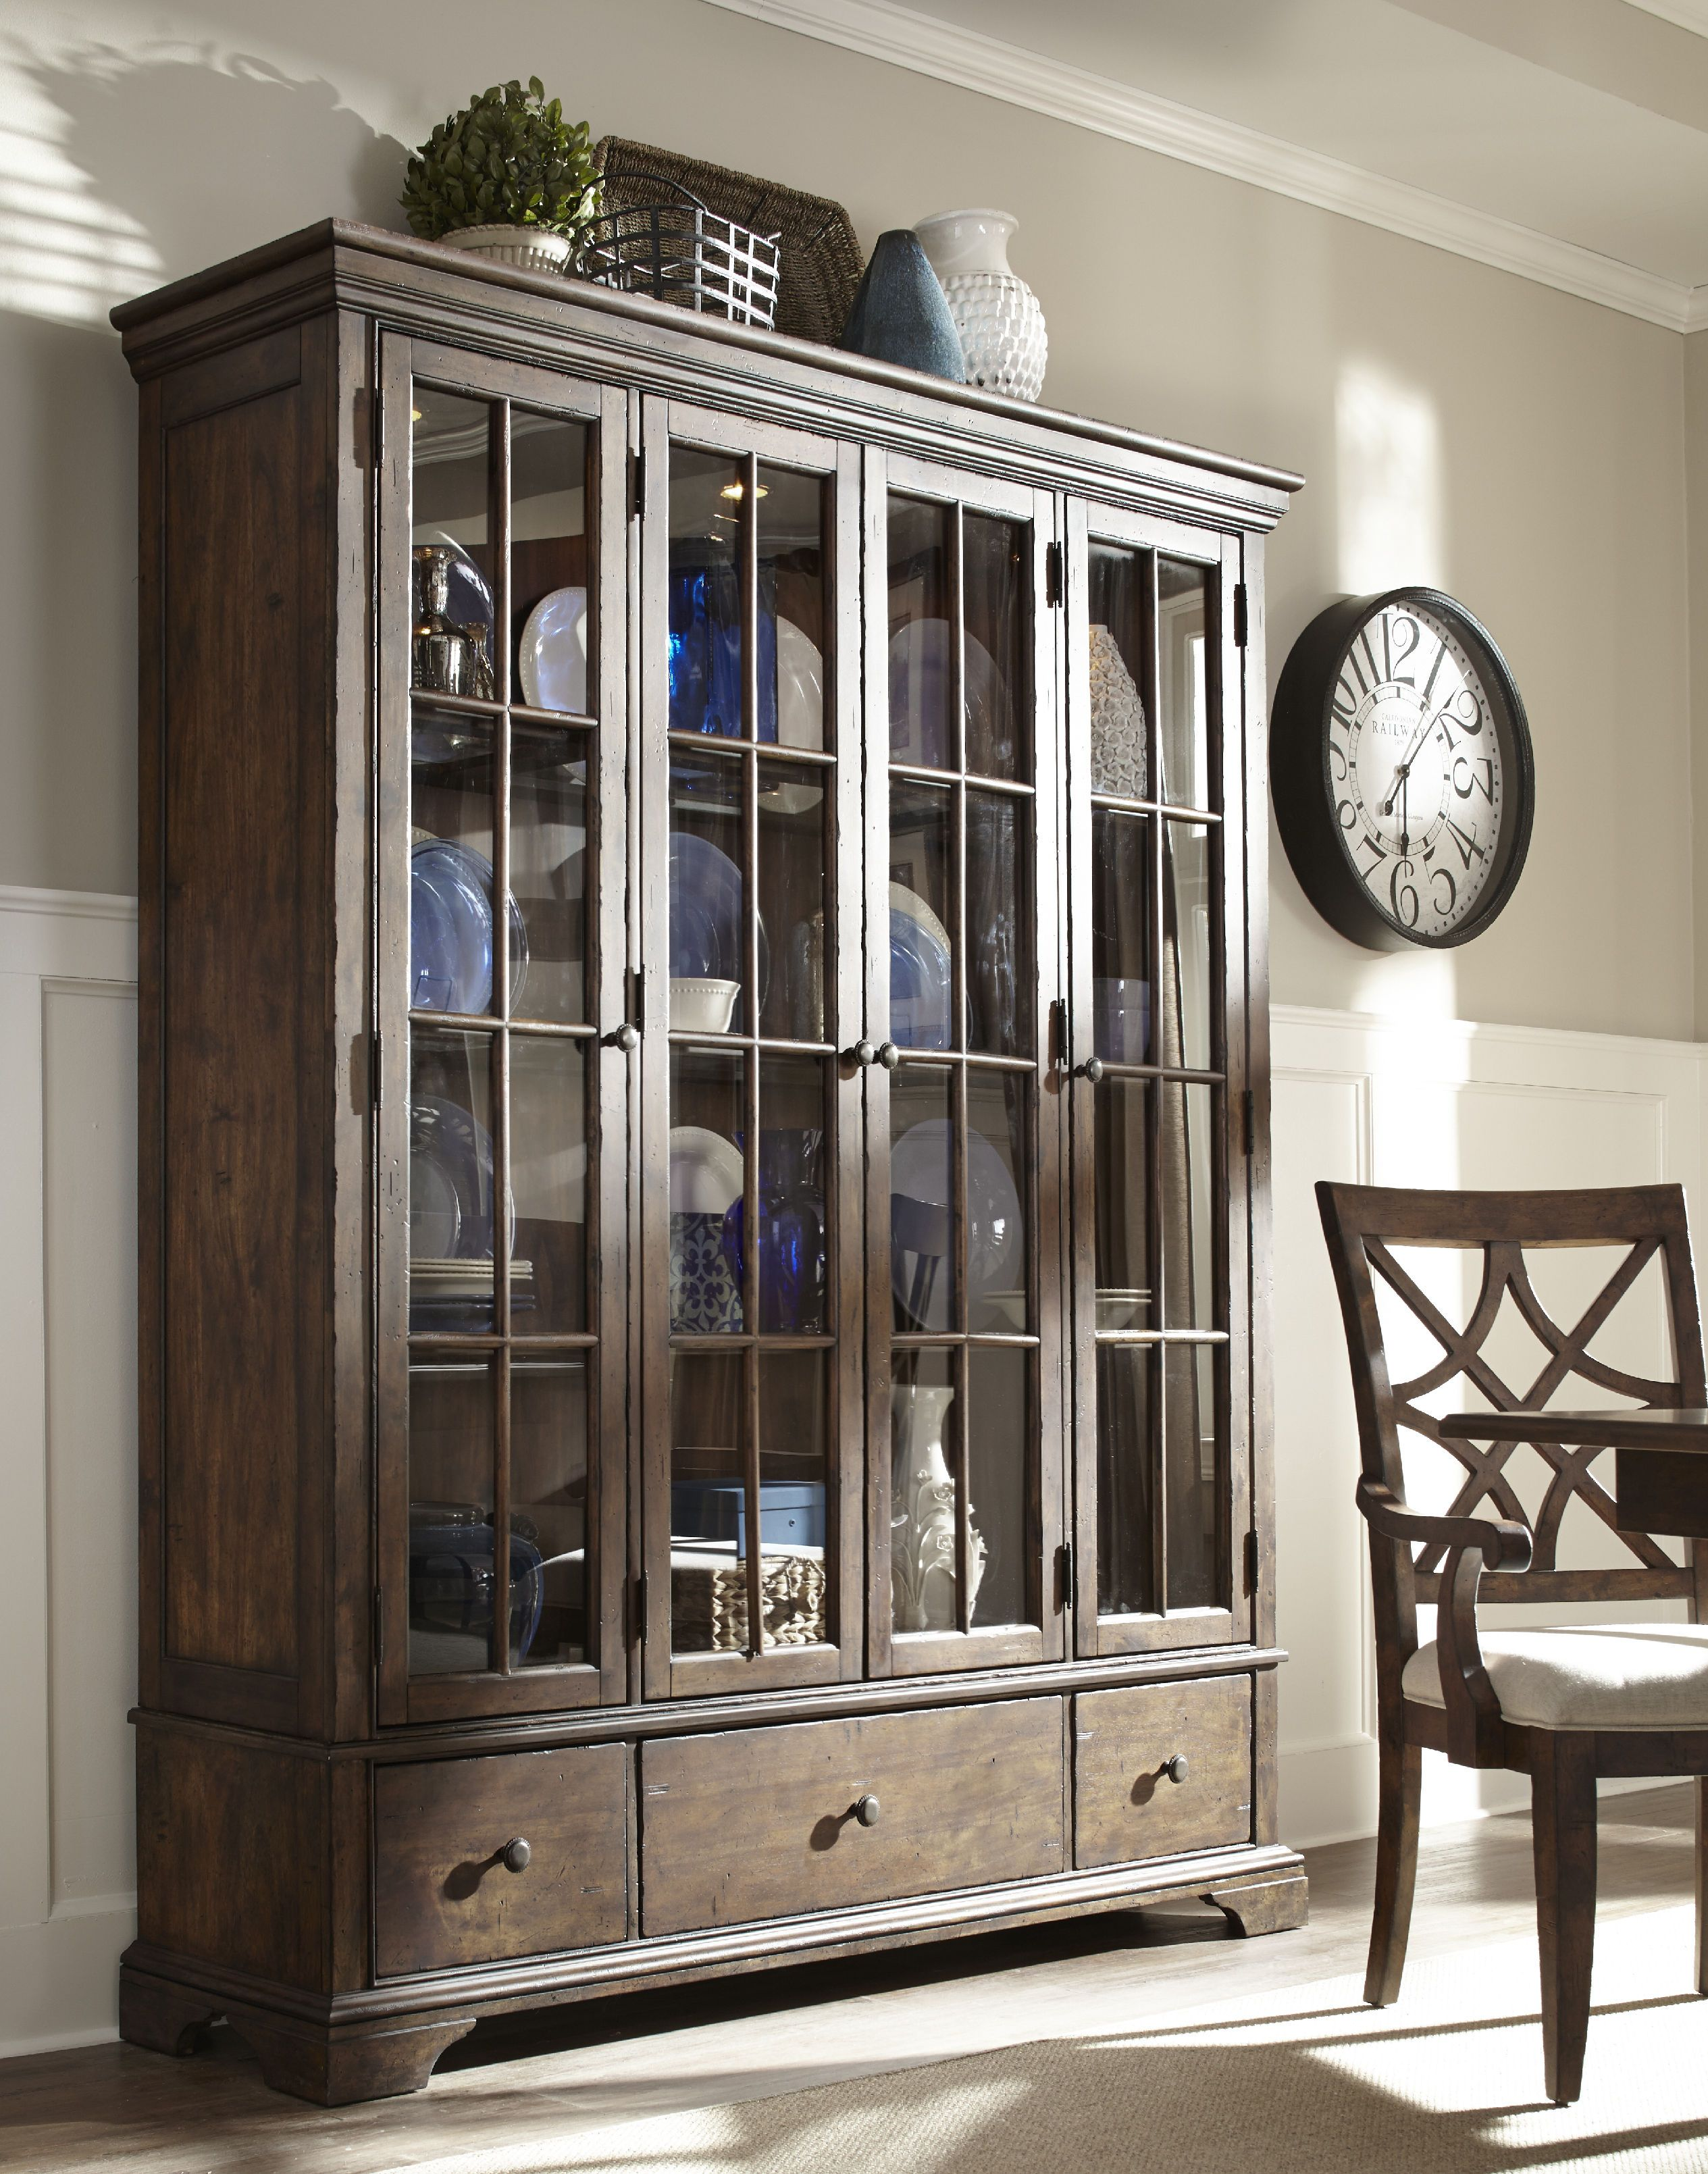 dining room curio cabinets | Trisha Yearwood Dining Room Monticello Dining Room Curio ...